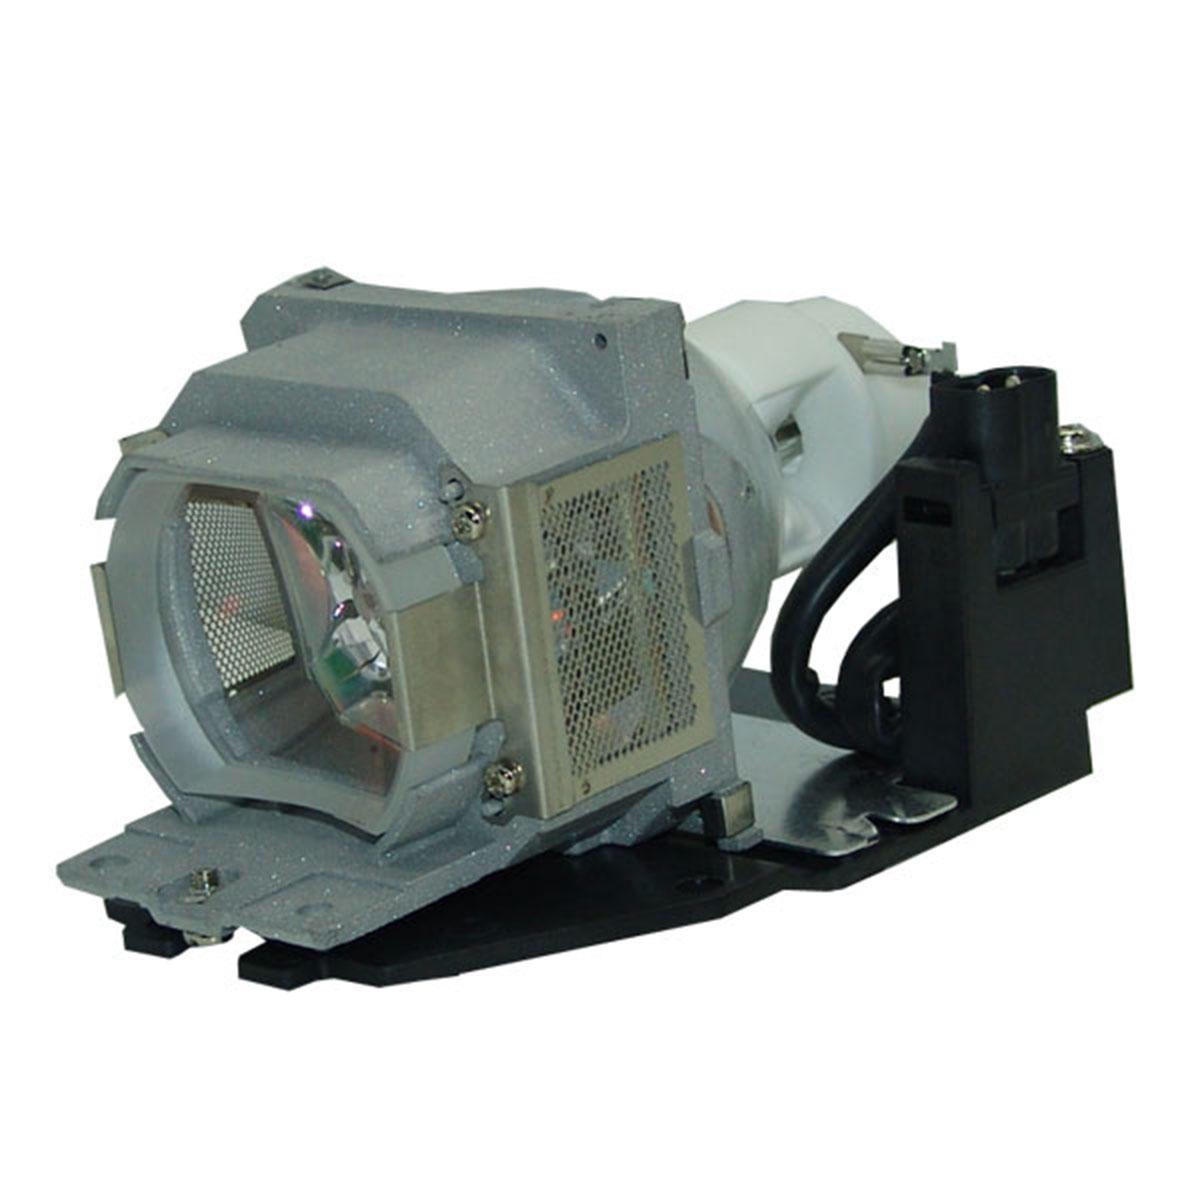 Sony LMP-E191 FP Lamp